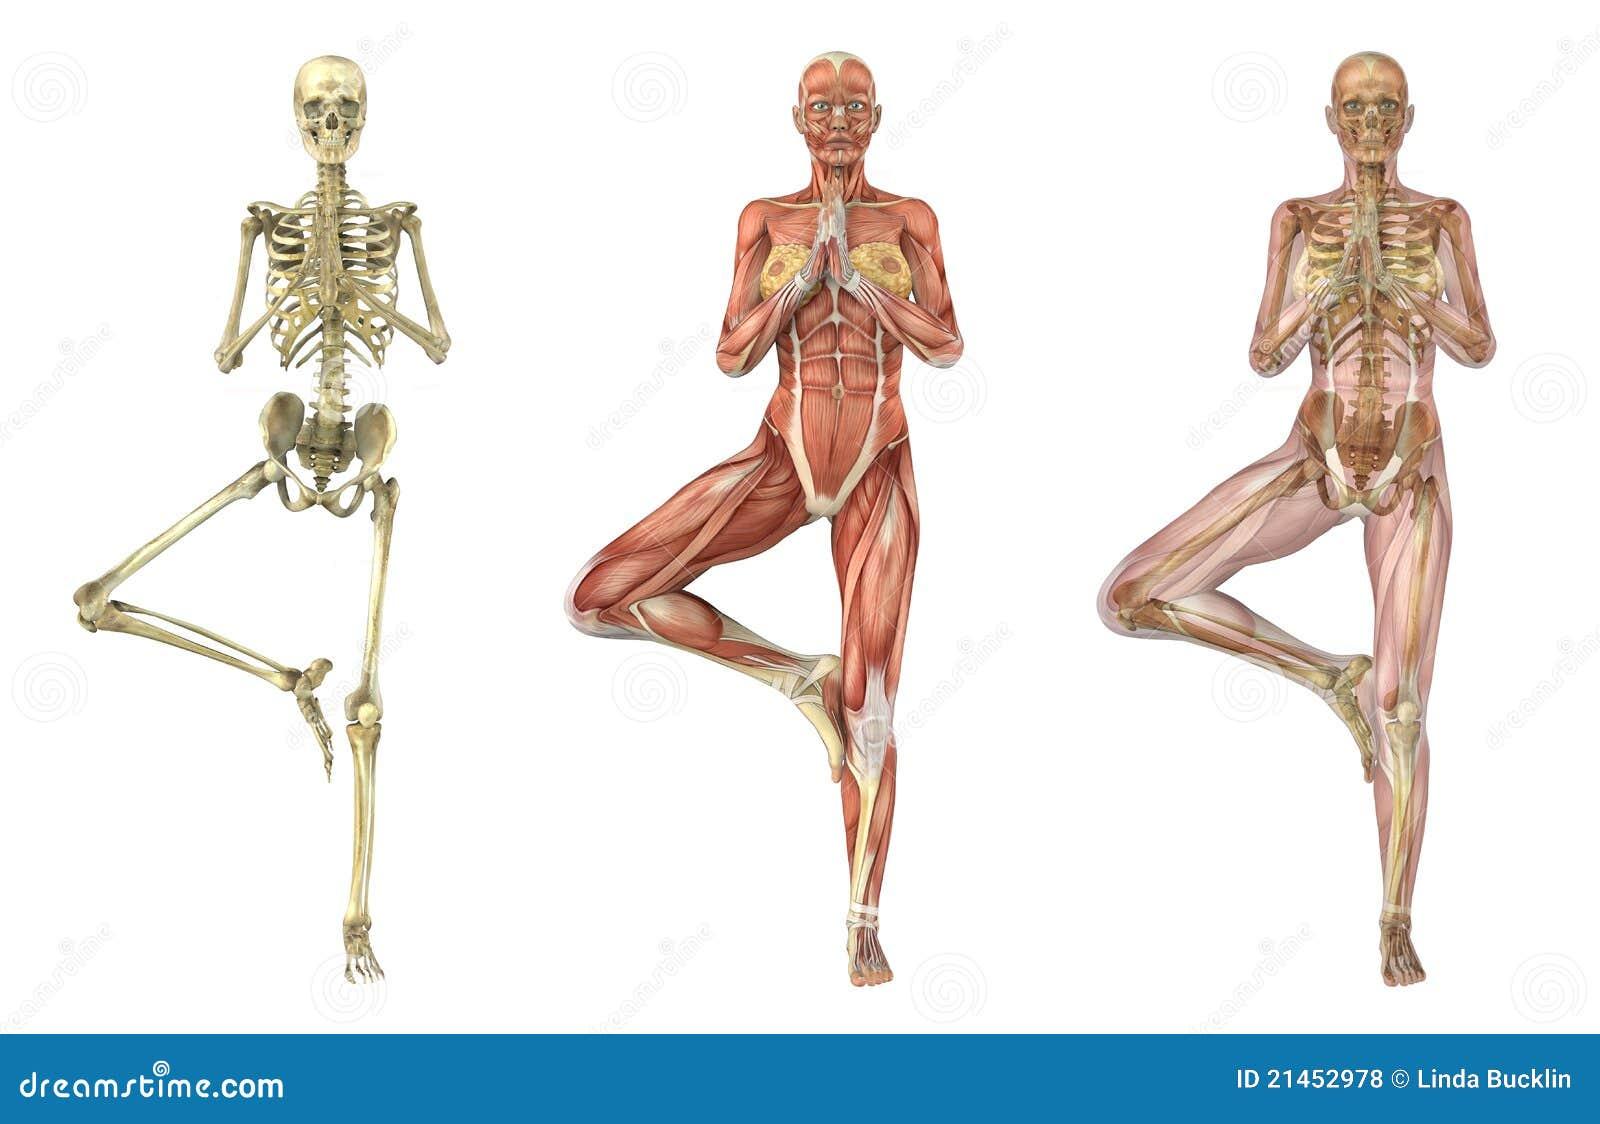 Yoga Tree Pose - Anatomical Overlays Royalty Free Stock ...